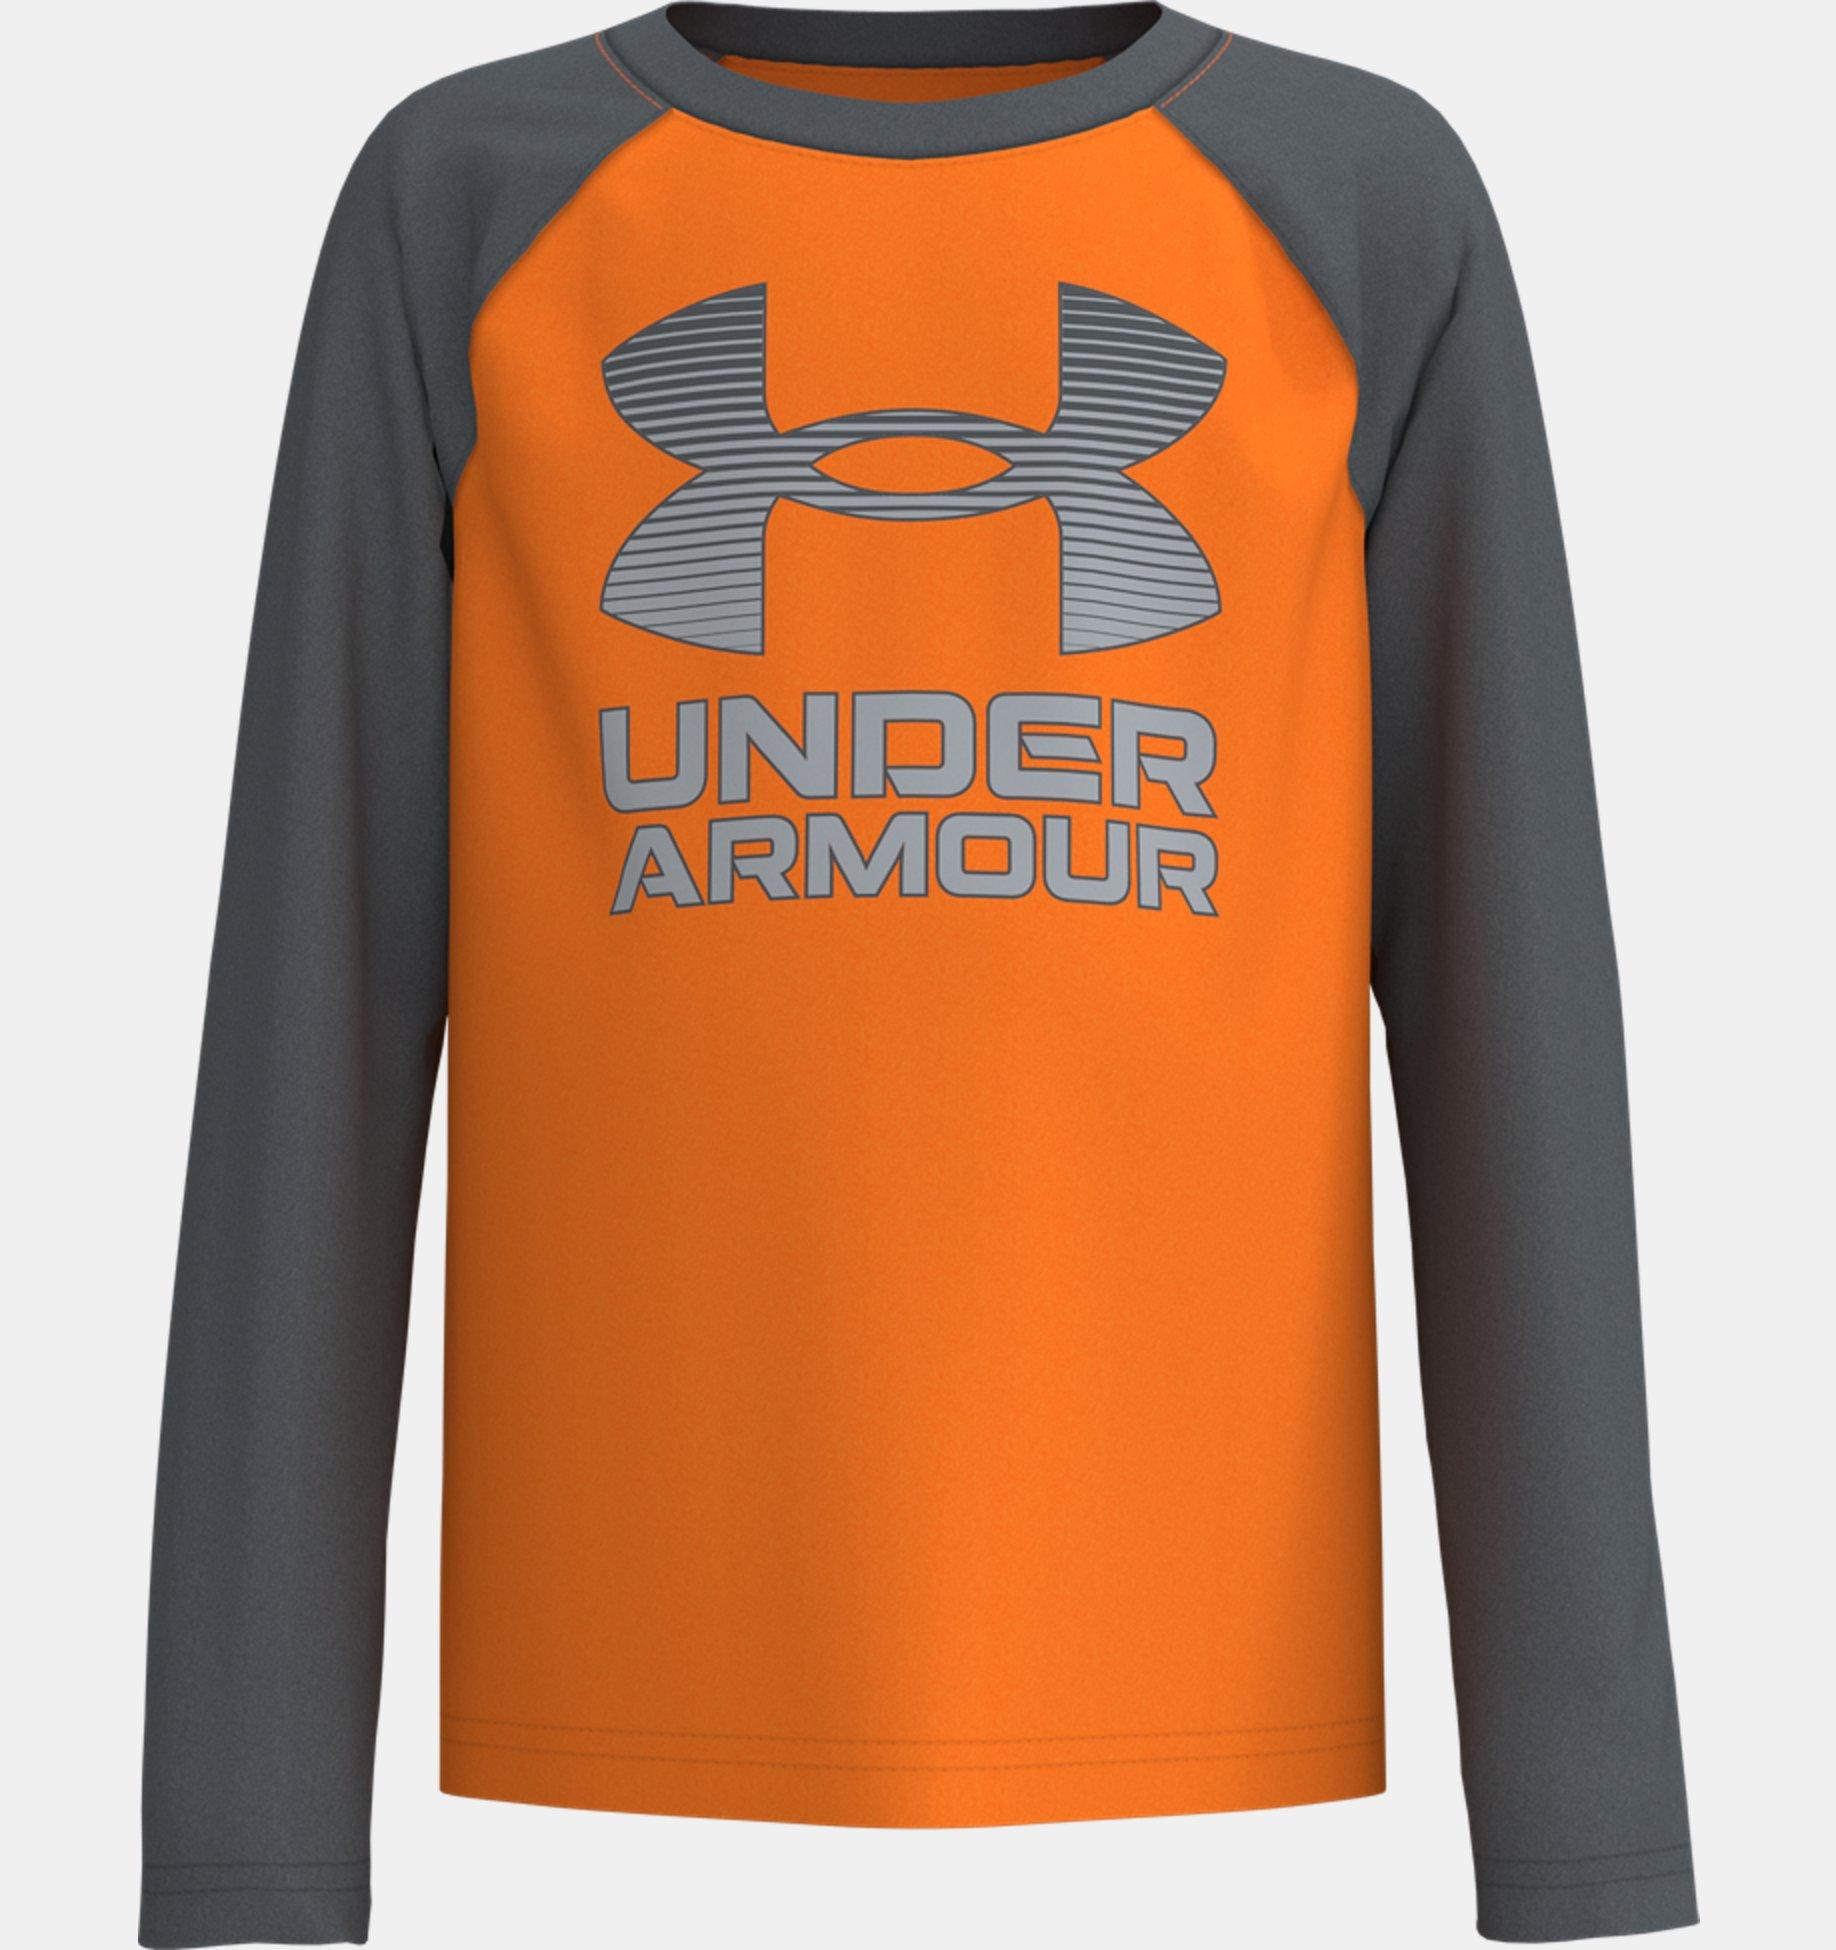 Underarmour Boys Infant UA Symbol Raglan Long Sleeve